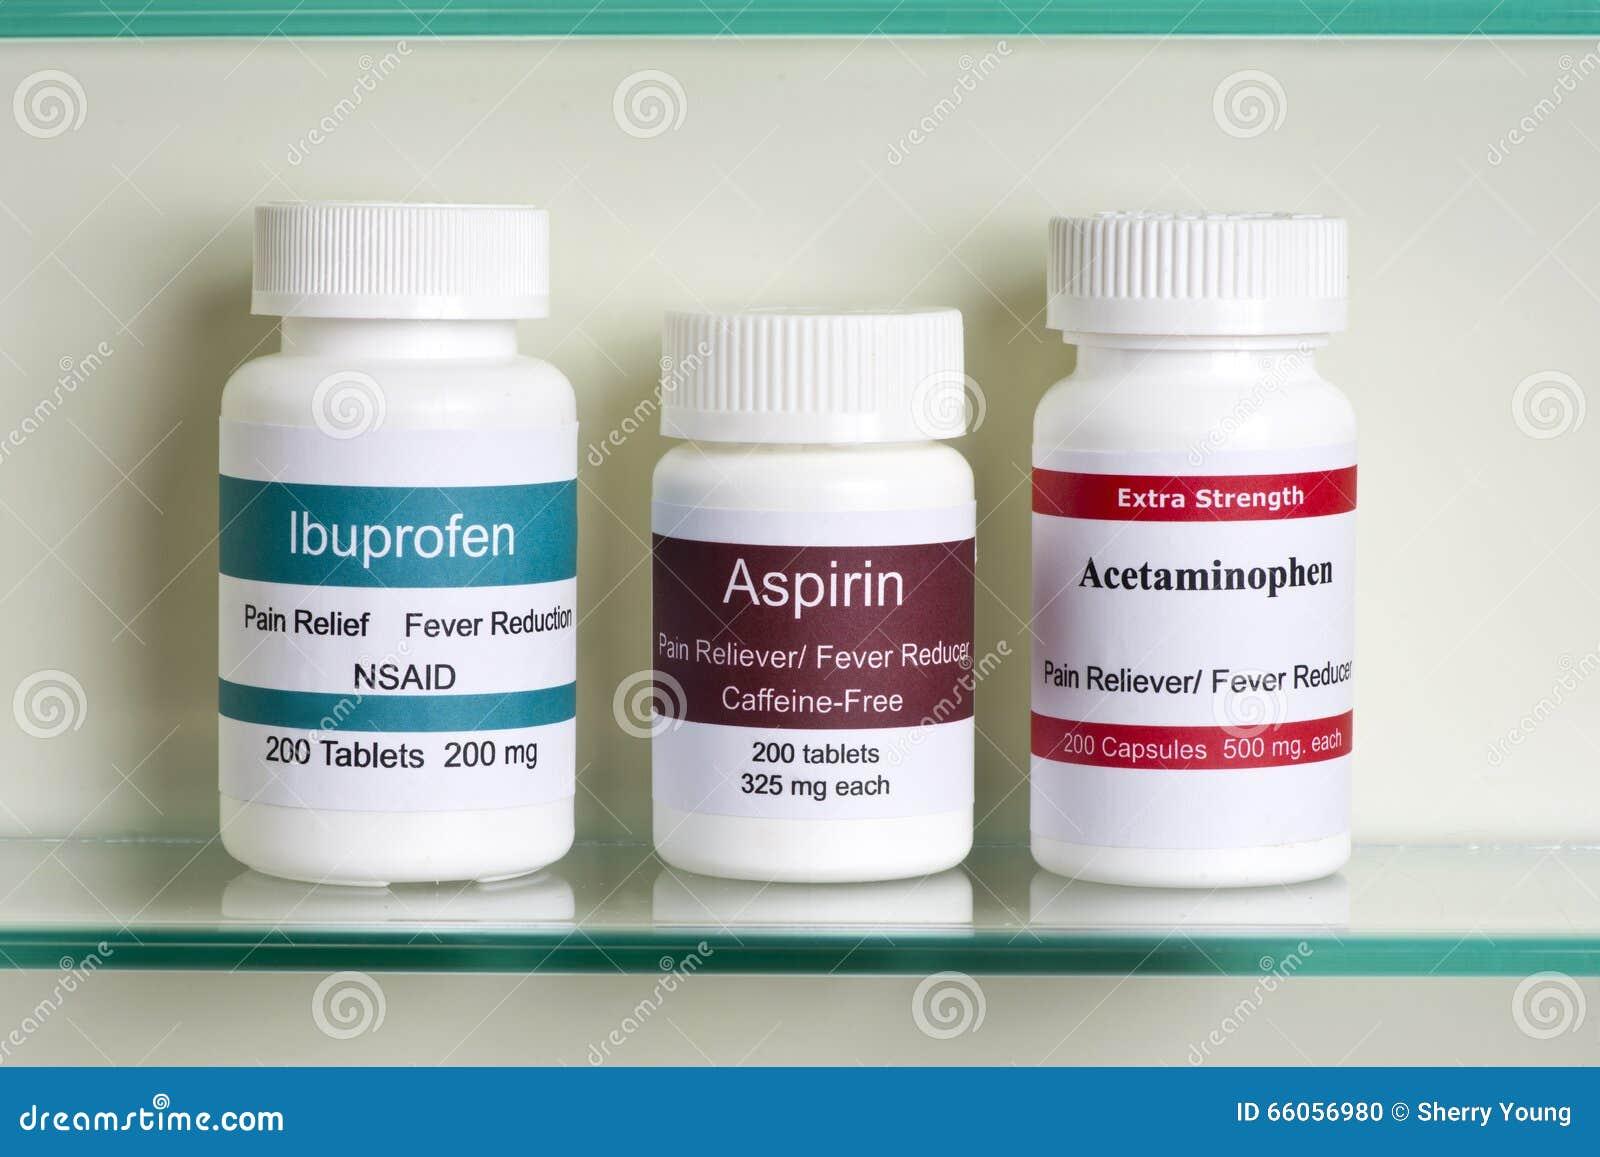 aspirin ibuprofen and tylenol